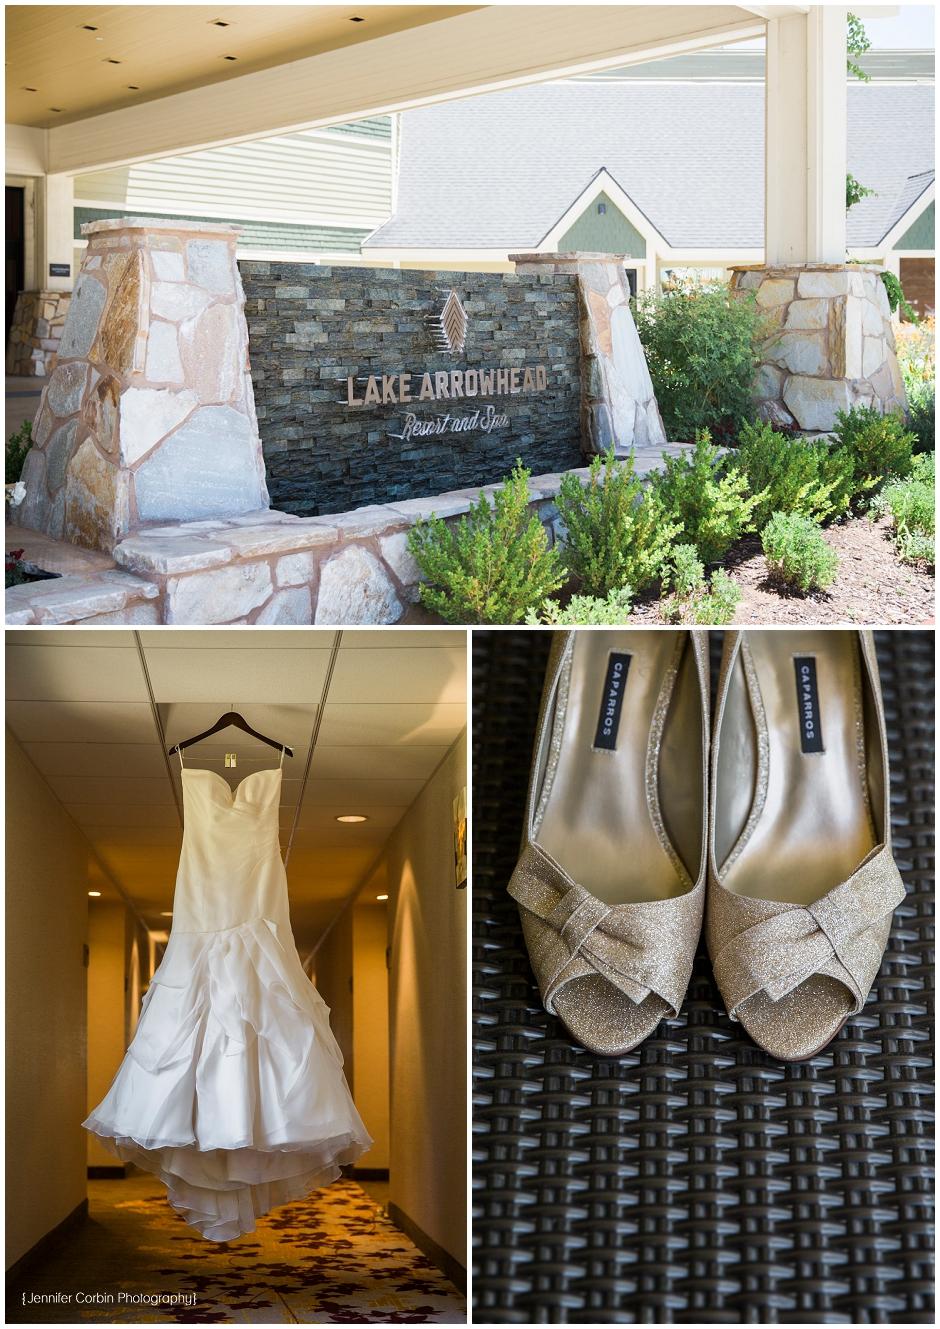 Lake Arrowhead Wedding (1)